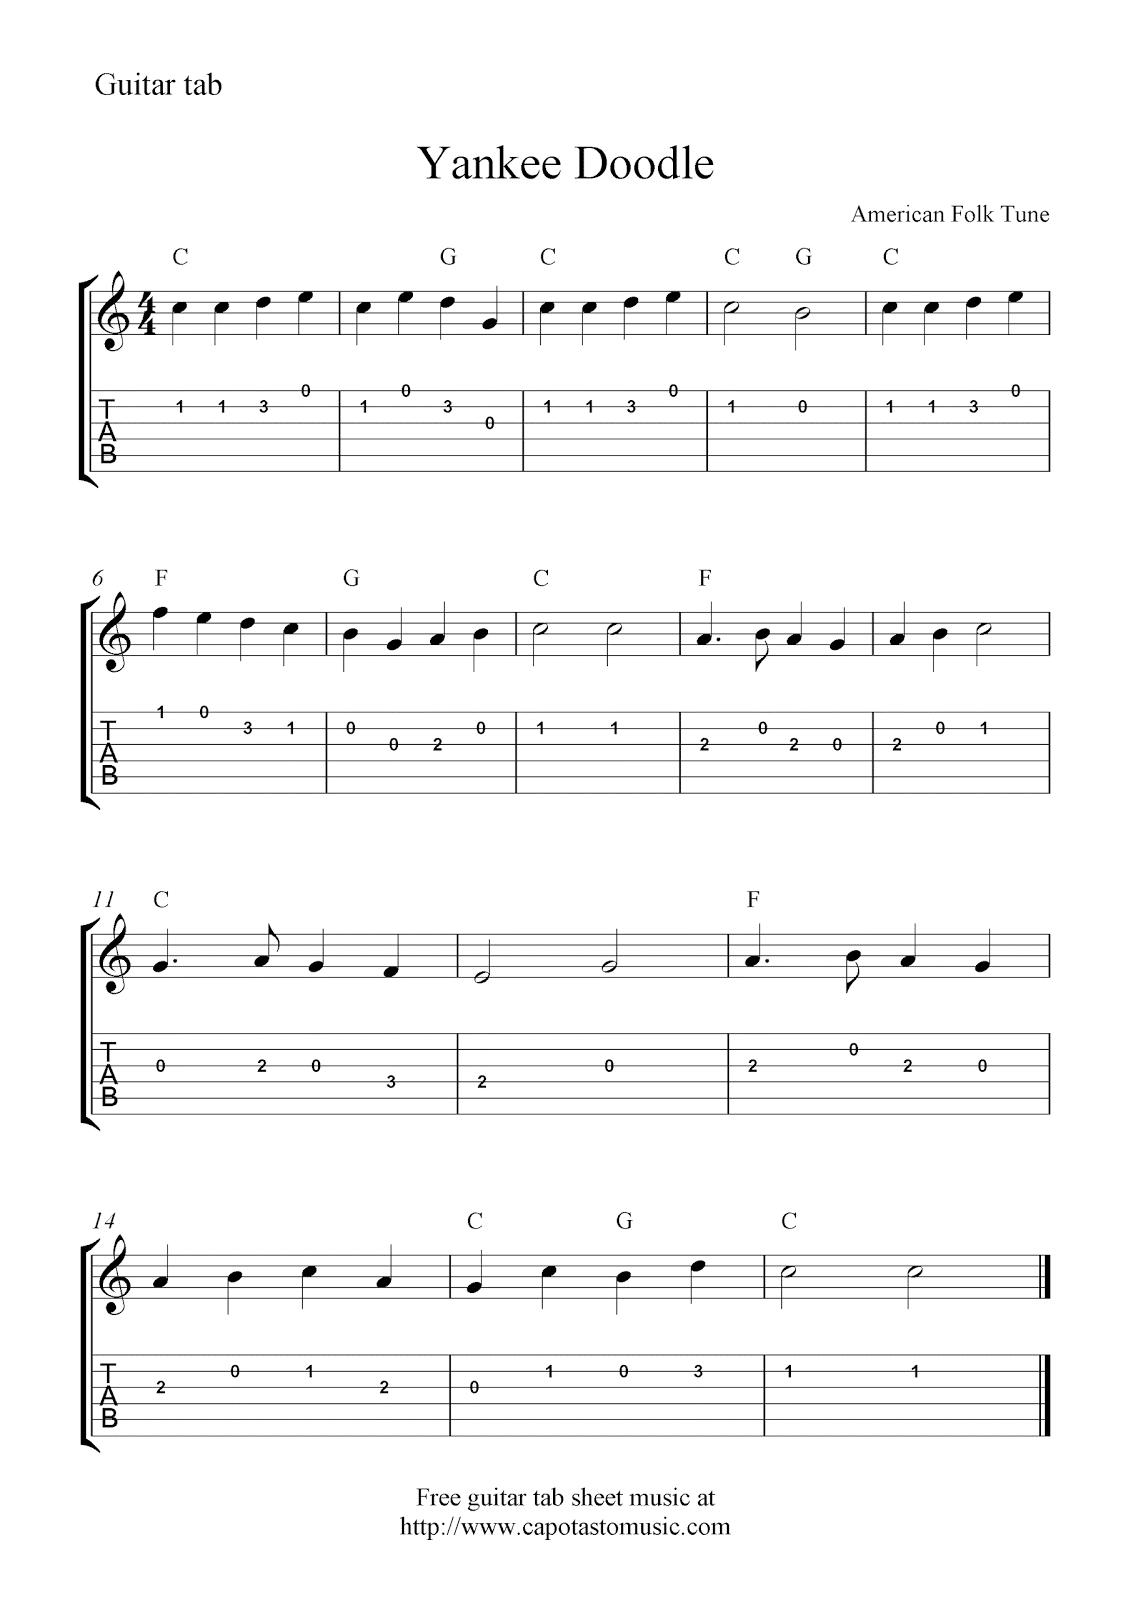 Yankee Doodleeasy Free Guitar Tab Sheet Music Score